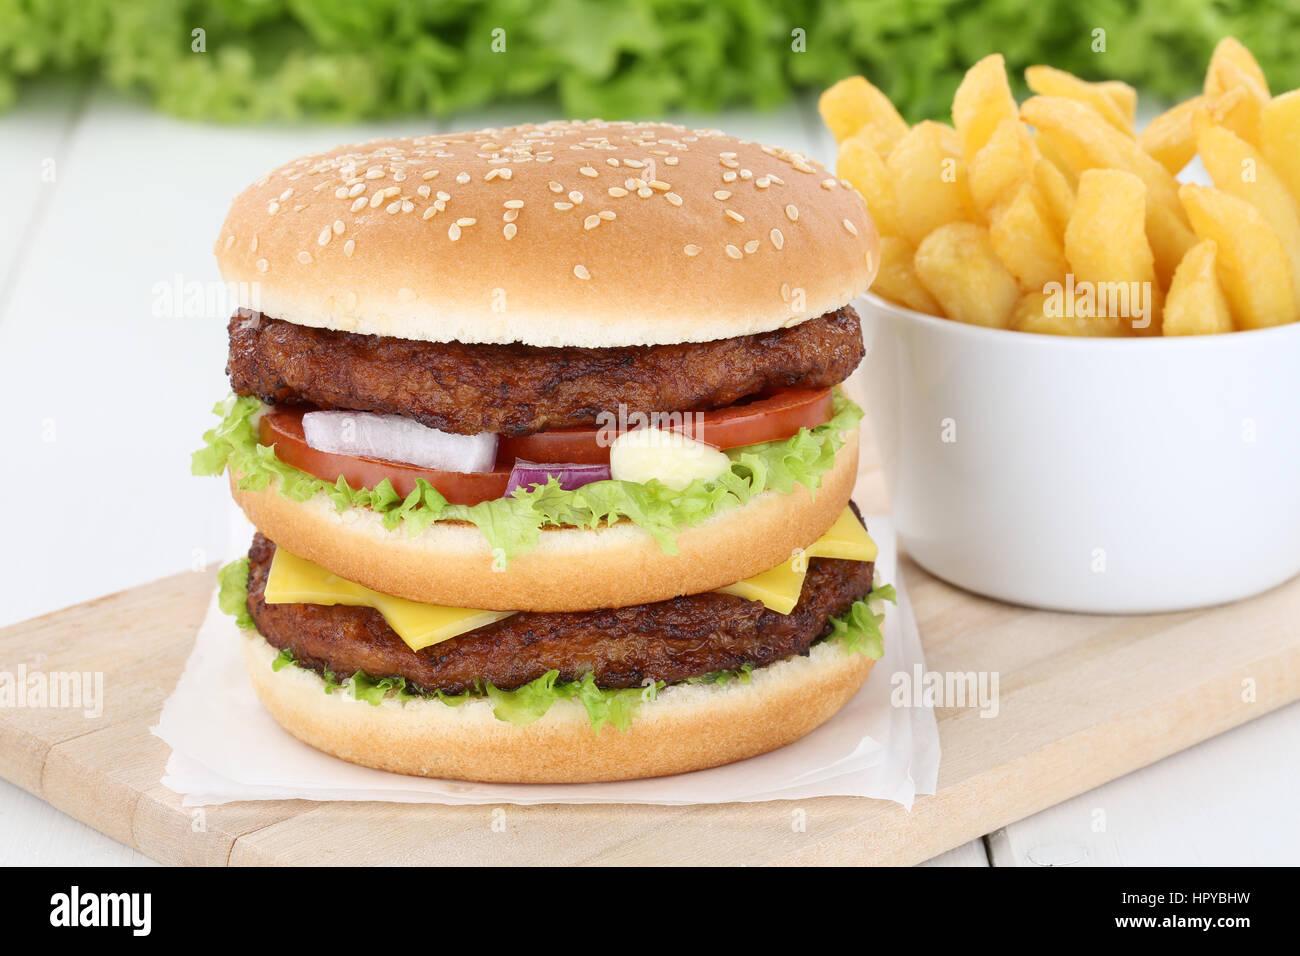 Burger double hamburger accompagné de frites fromage laitue tomates mauvaises Photo Stock